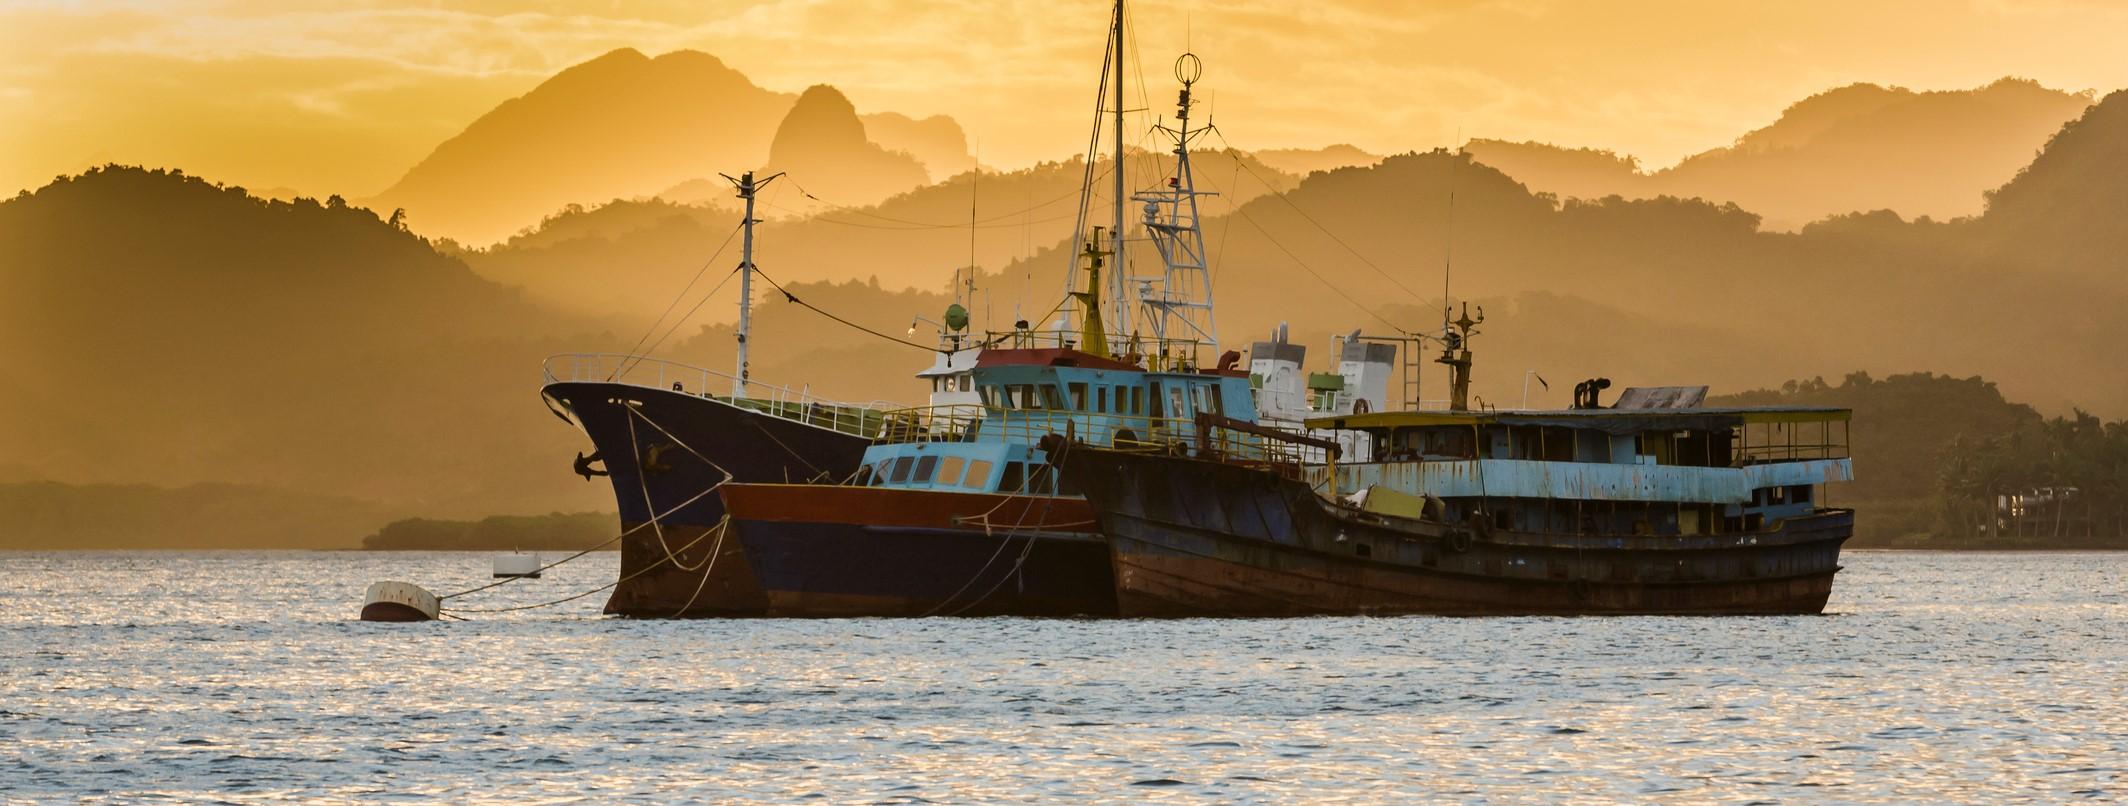 Fishing boats outside Suva (Photo: Pete Atkinson/Getty Images)